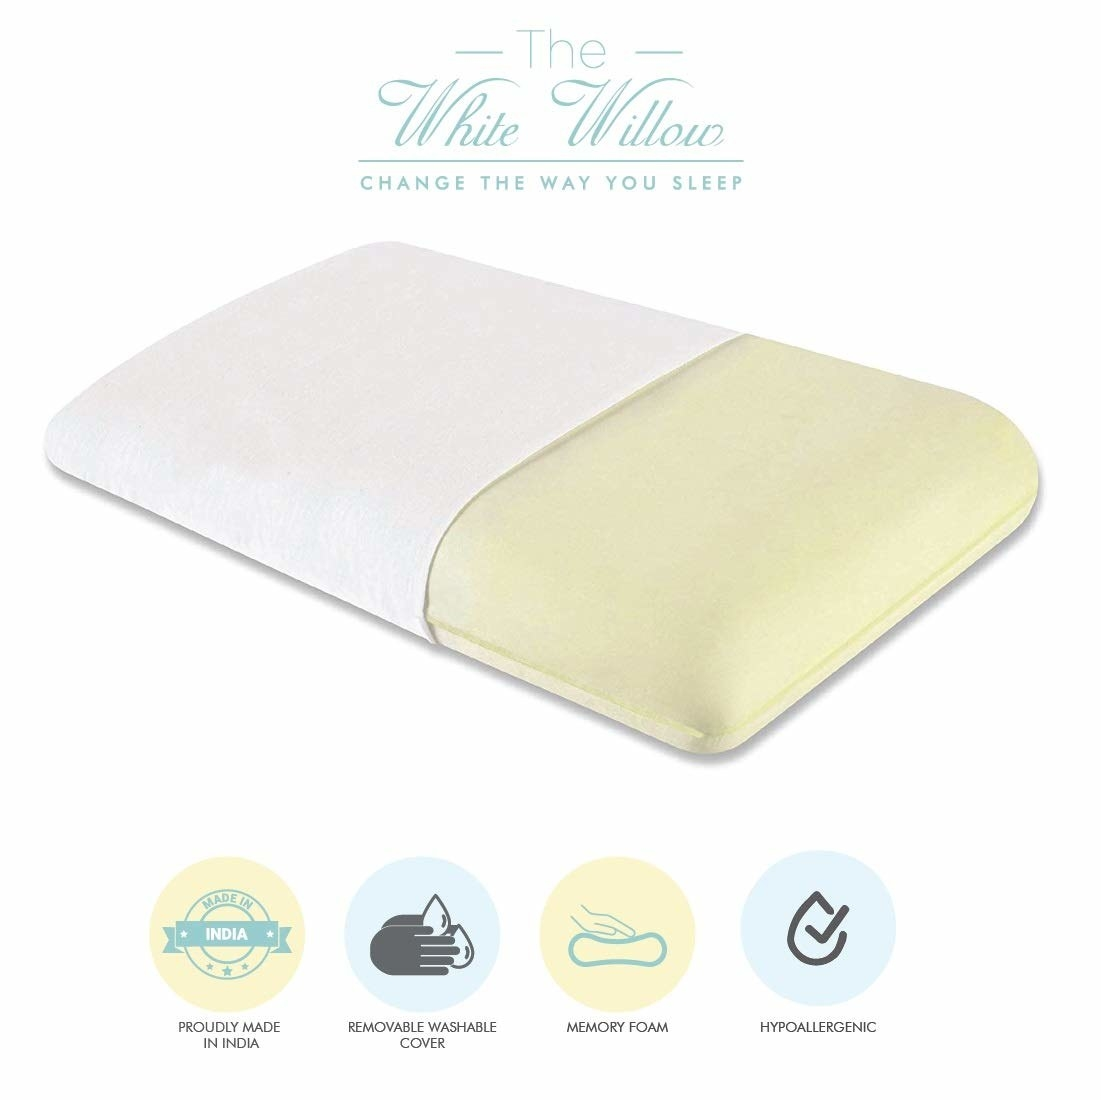 A cream memory foam pillow